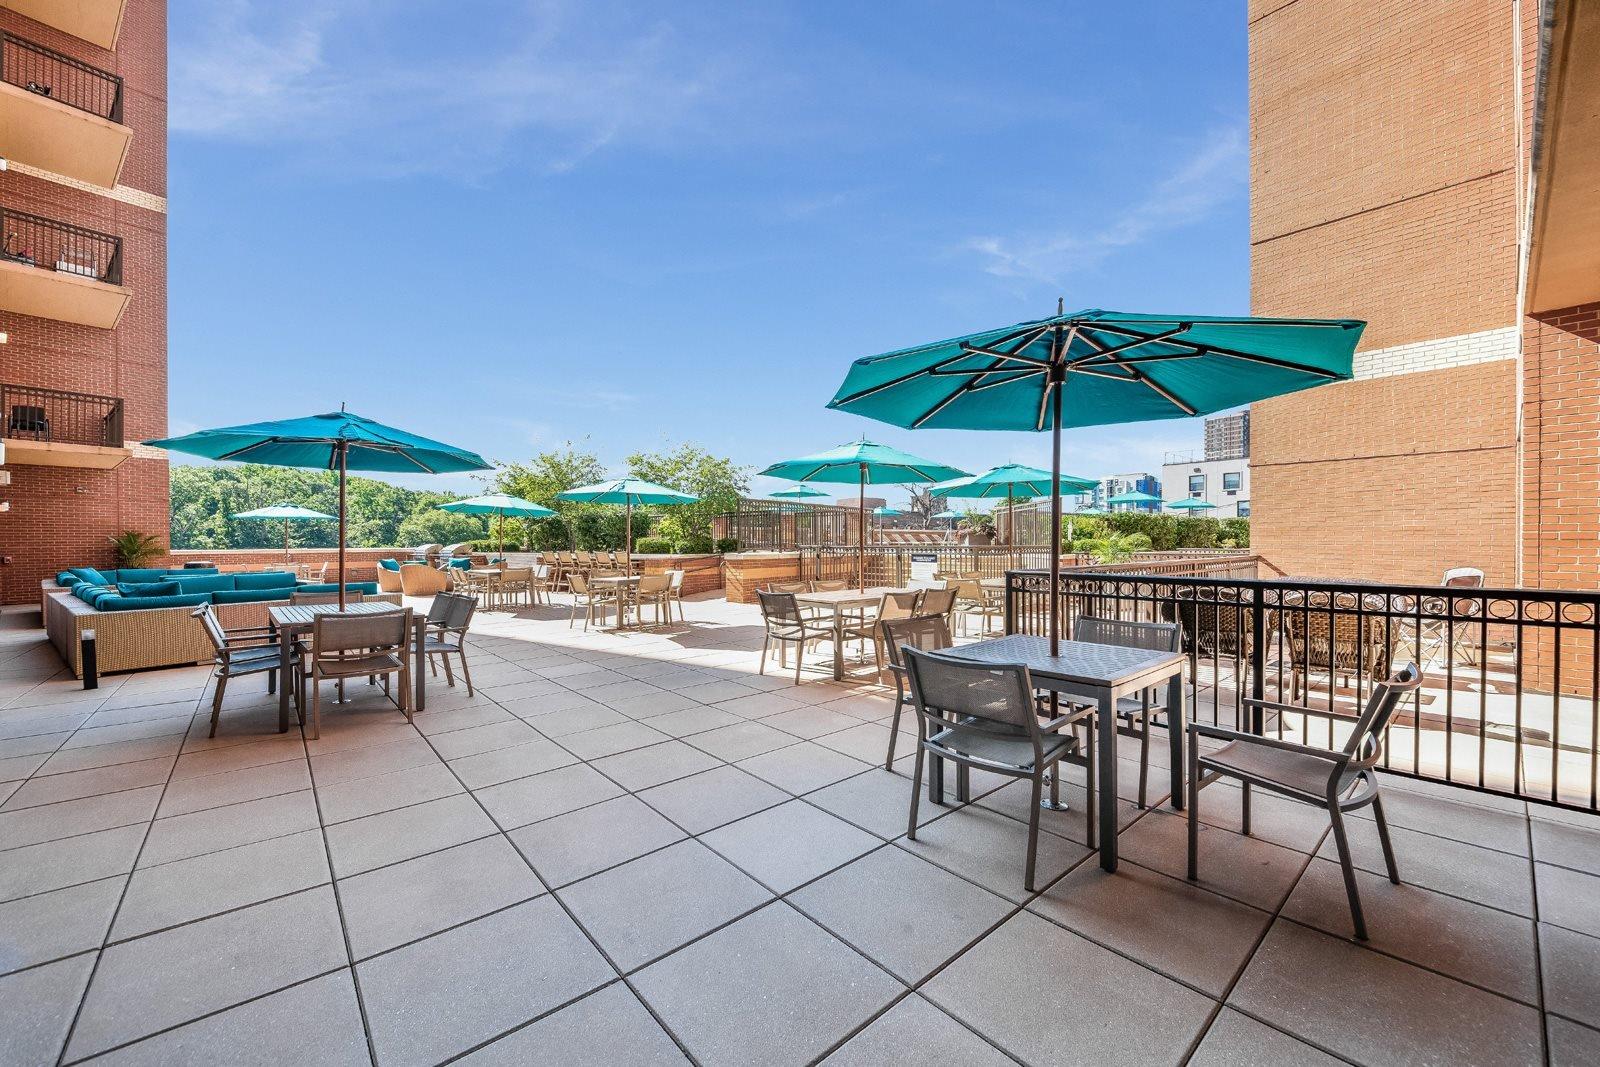 Outdoor Lounge at Twenty50 by Windsor, 2050 Central Road, NJ